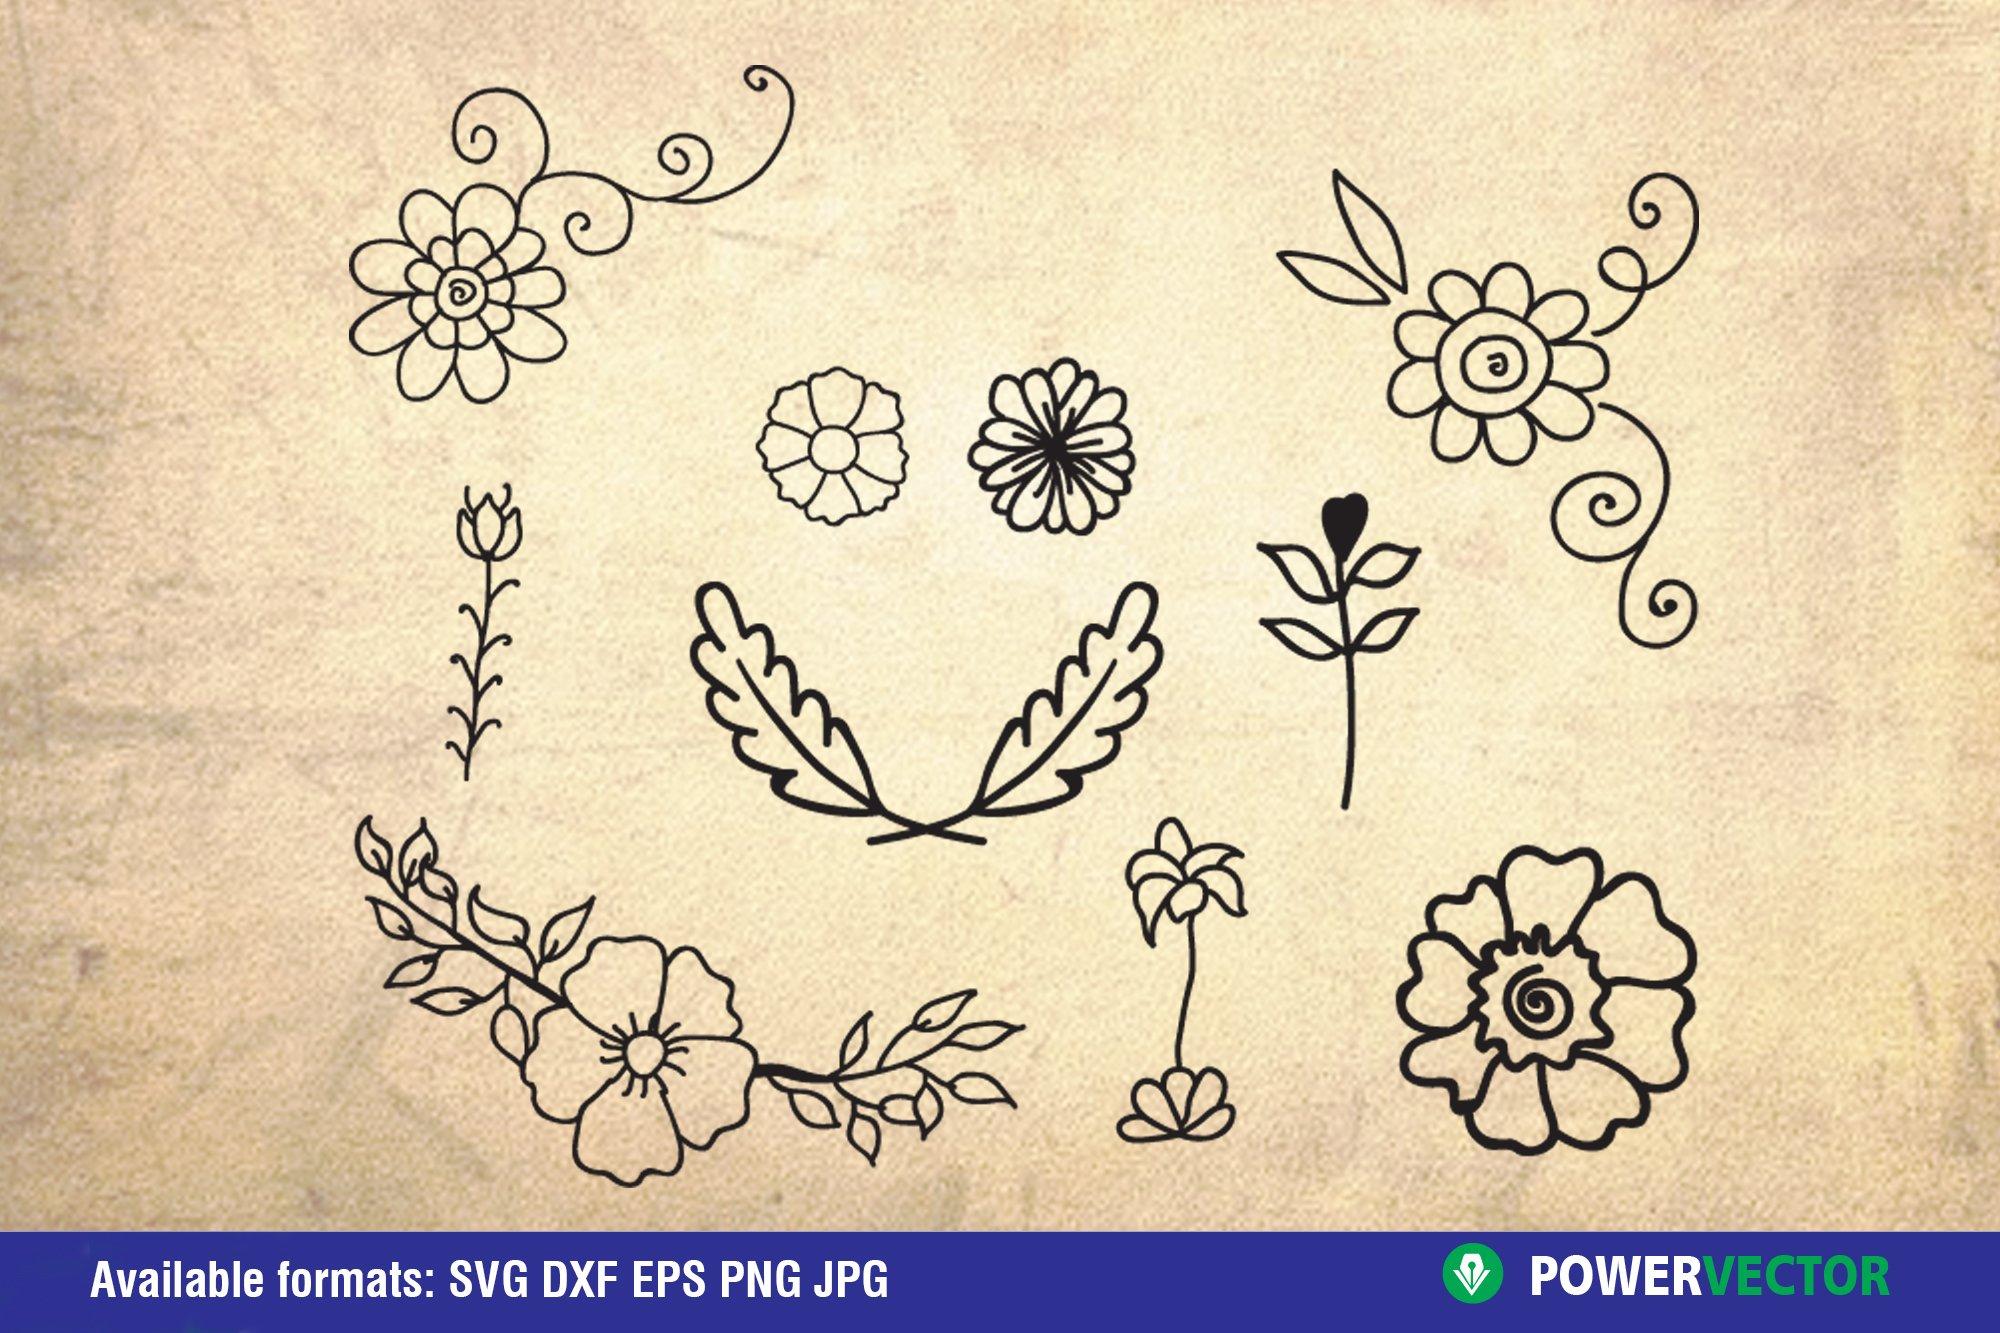 Flowers and Laurel Wreaths SVG Bundle example image 7